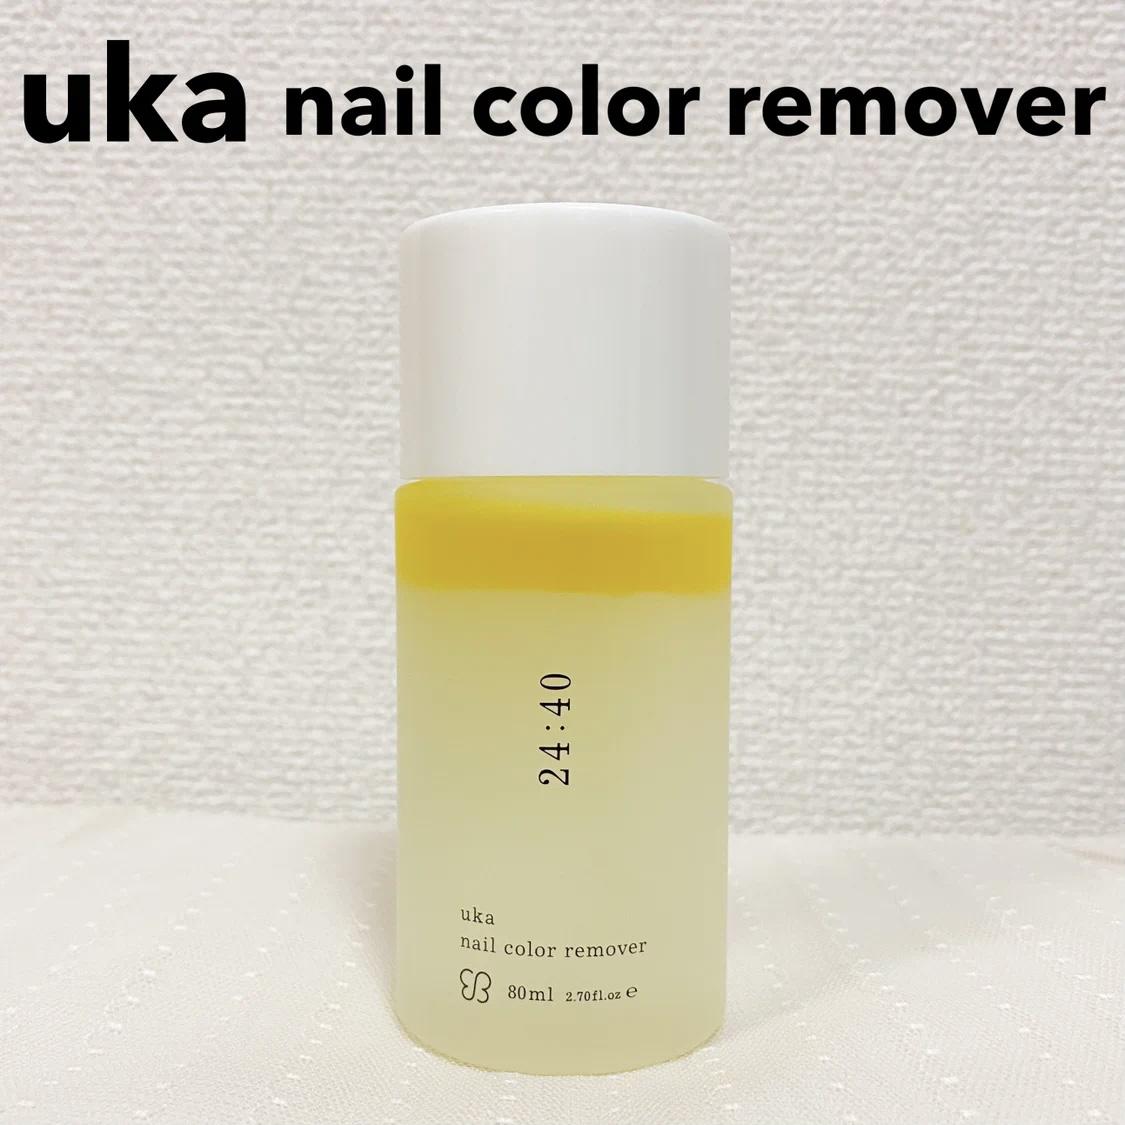 uka(ウカ)nail color remover 24:40を使った只野ひとみさんのクチコミ画像1